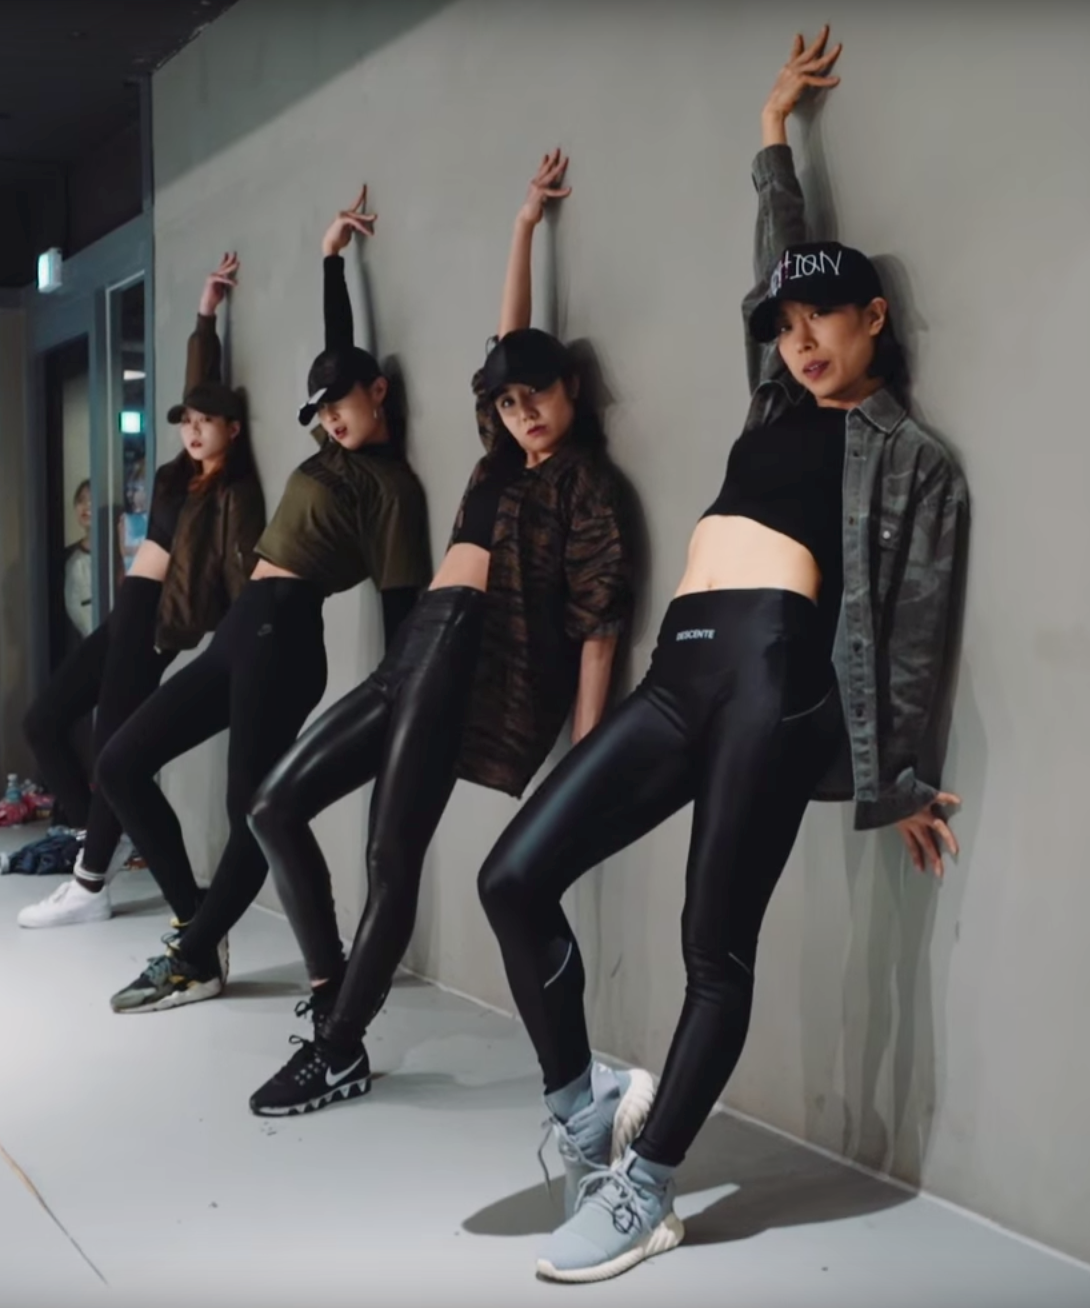 These K-Pop Dance Groups Straight Up Slay | Dance studio ...